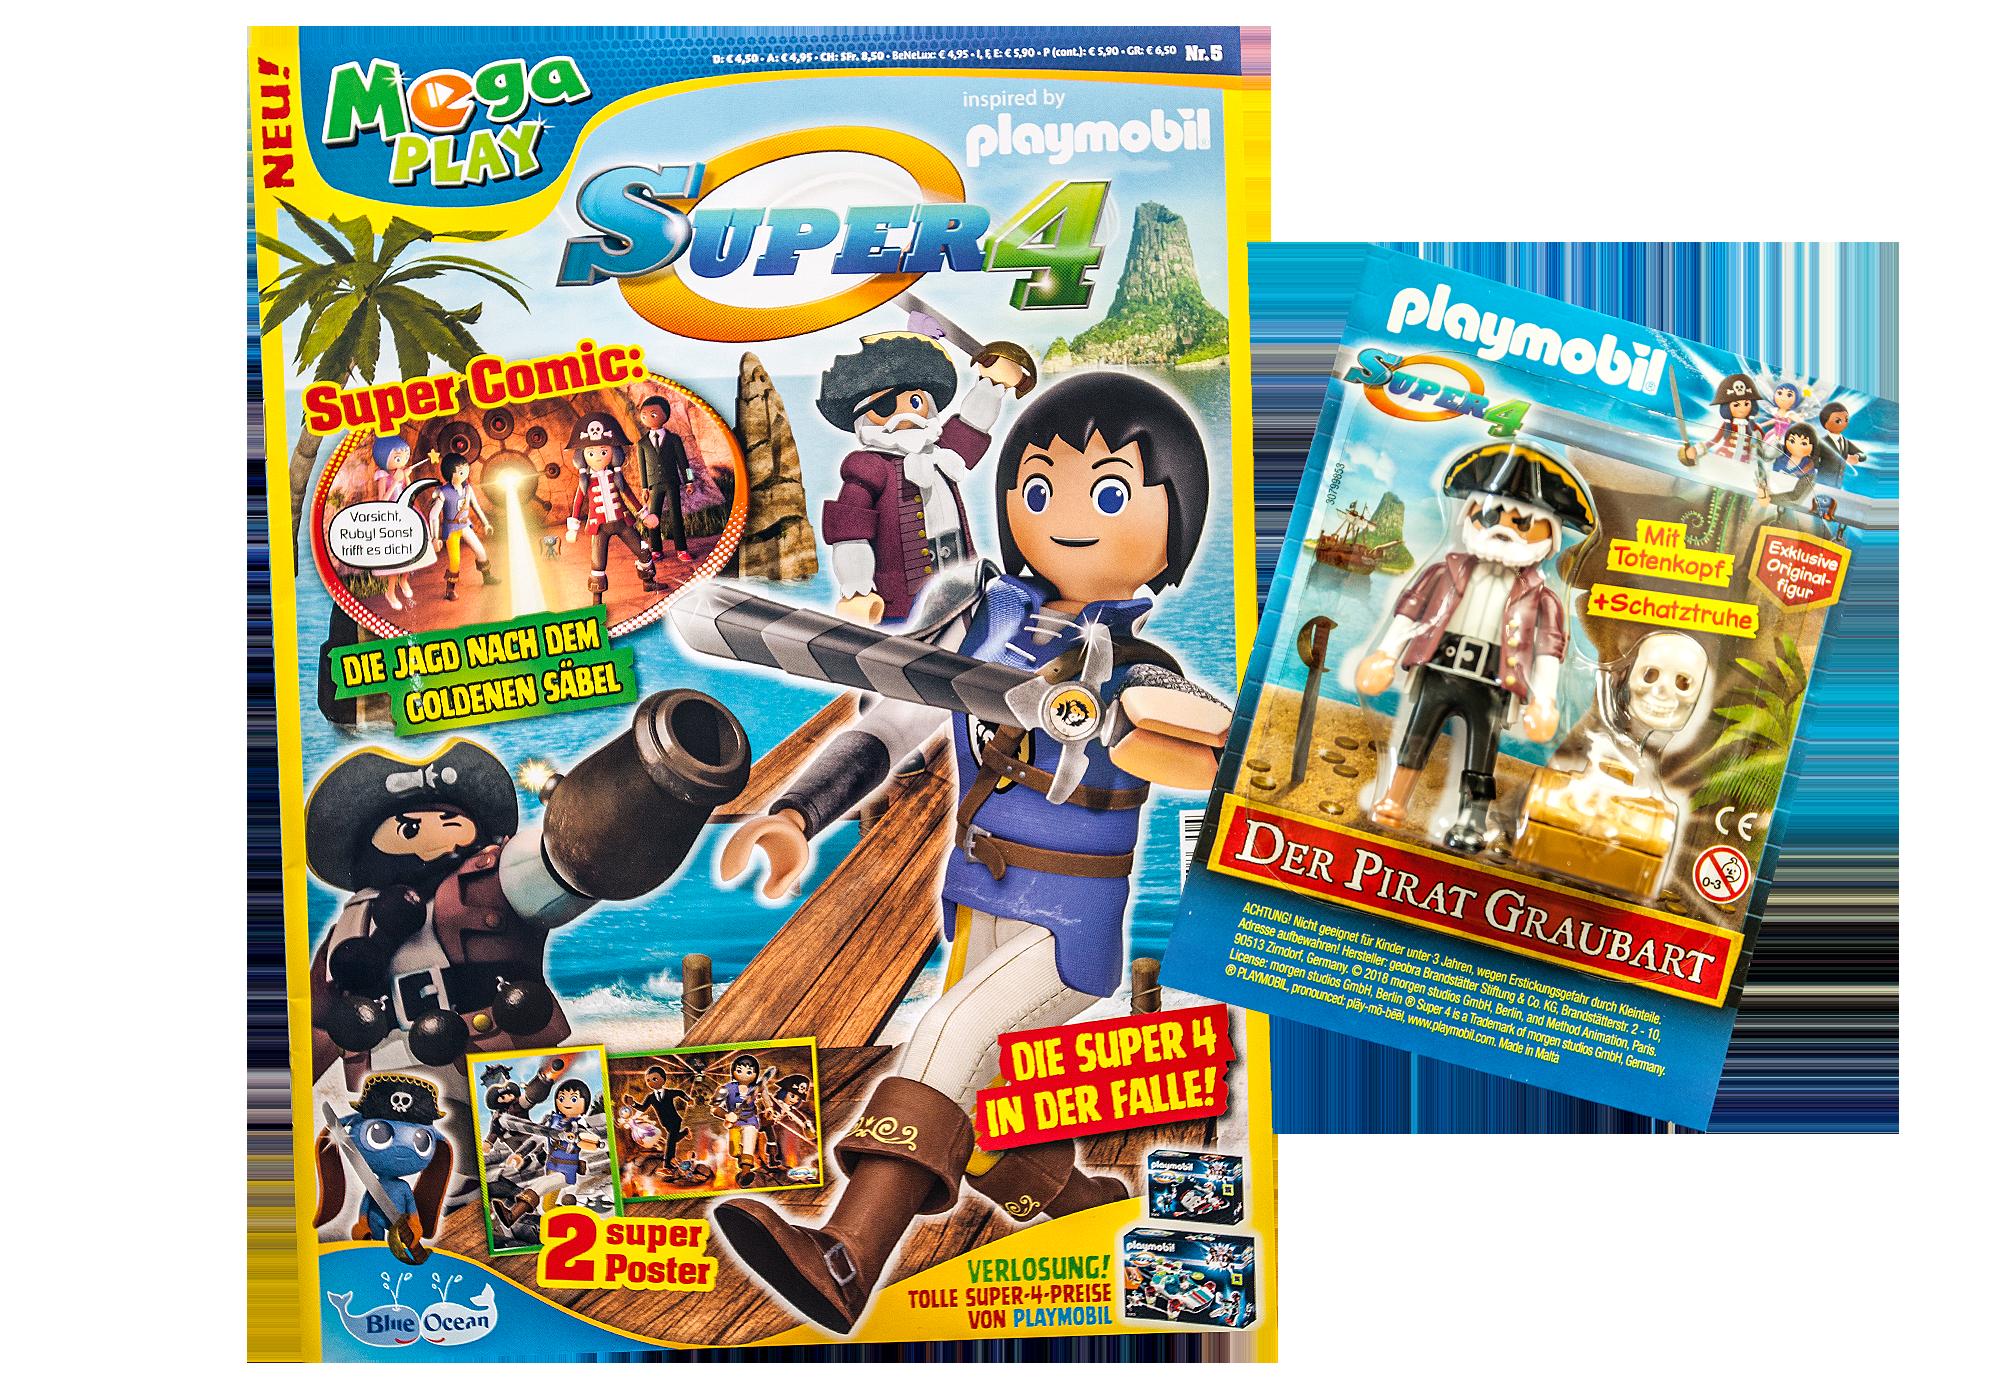 http://media.playmobil.com/i/playmobil/80811_product_detail/Super 4-Magazin 01/2018 (Heft 12)